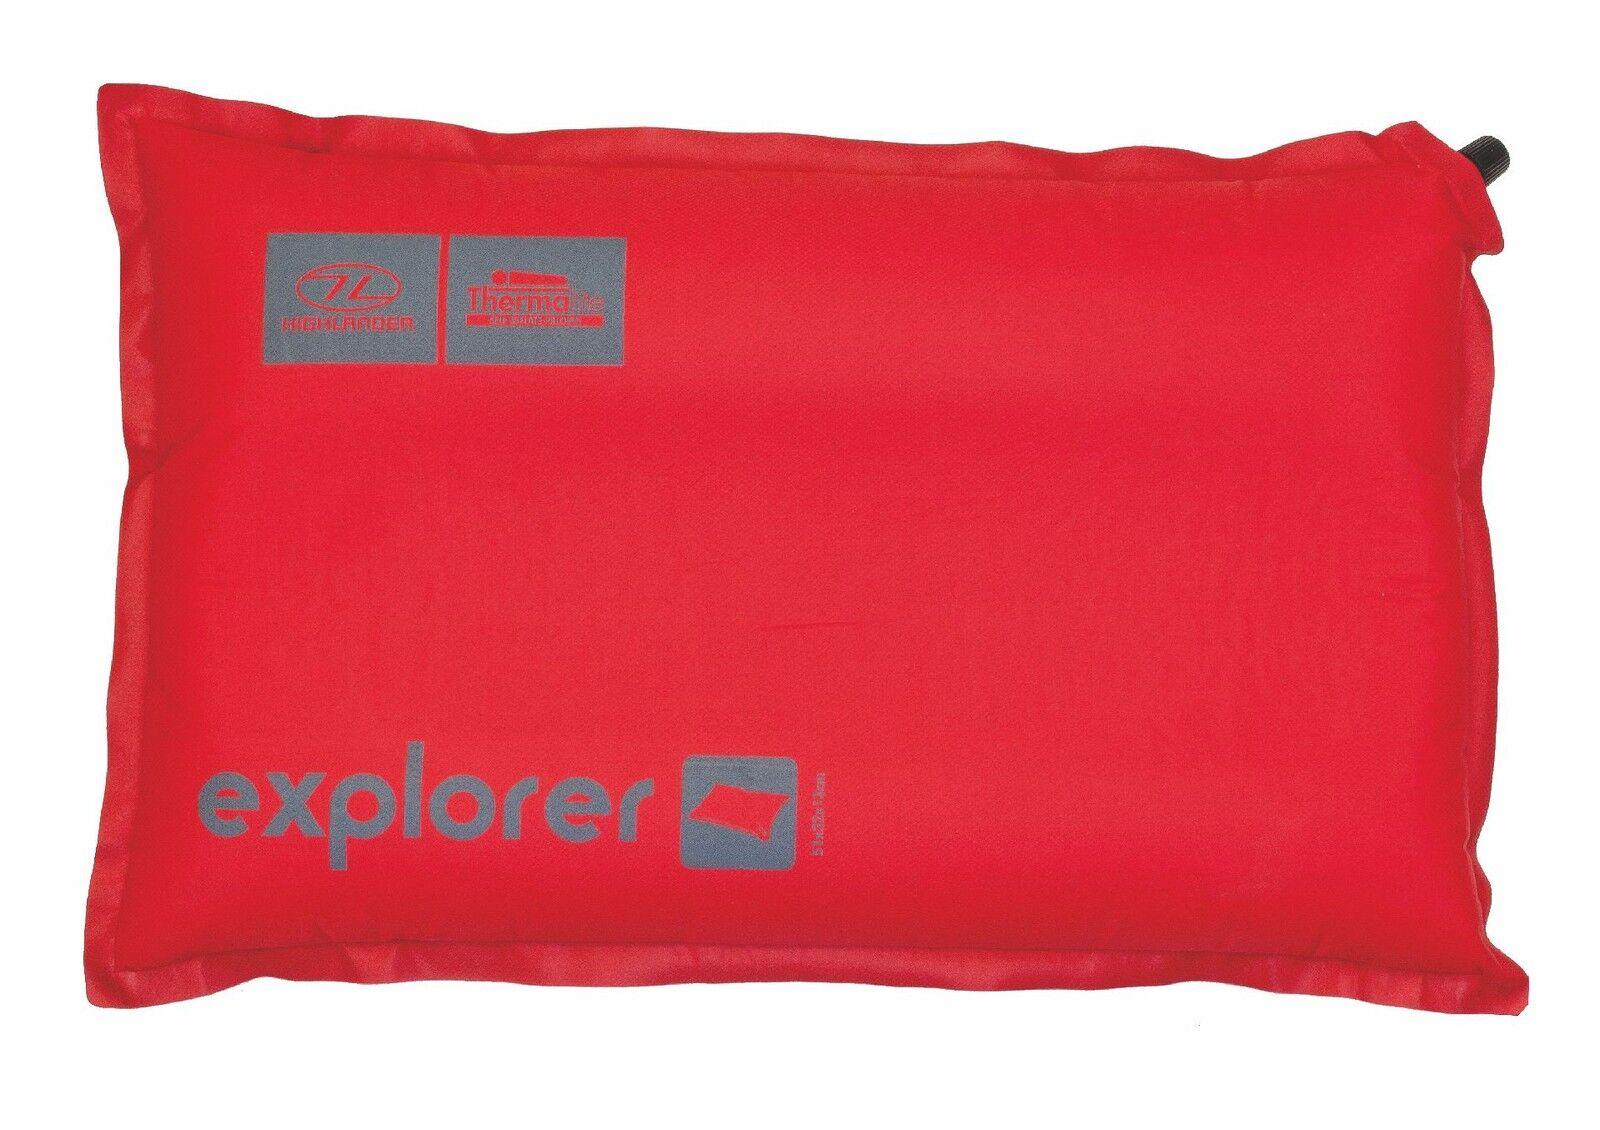 EXPLORER Self gonfler oreiller - Autogonflant de couchage Camping Camping Camping Militaire 4f29c9